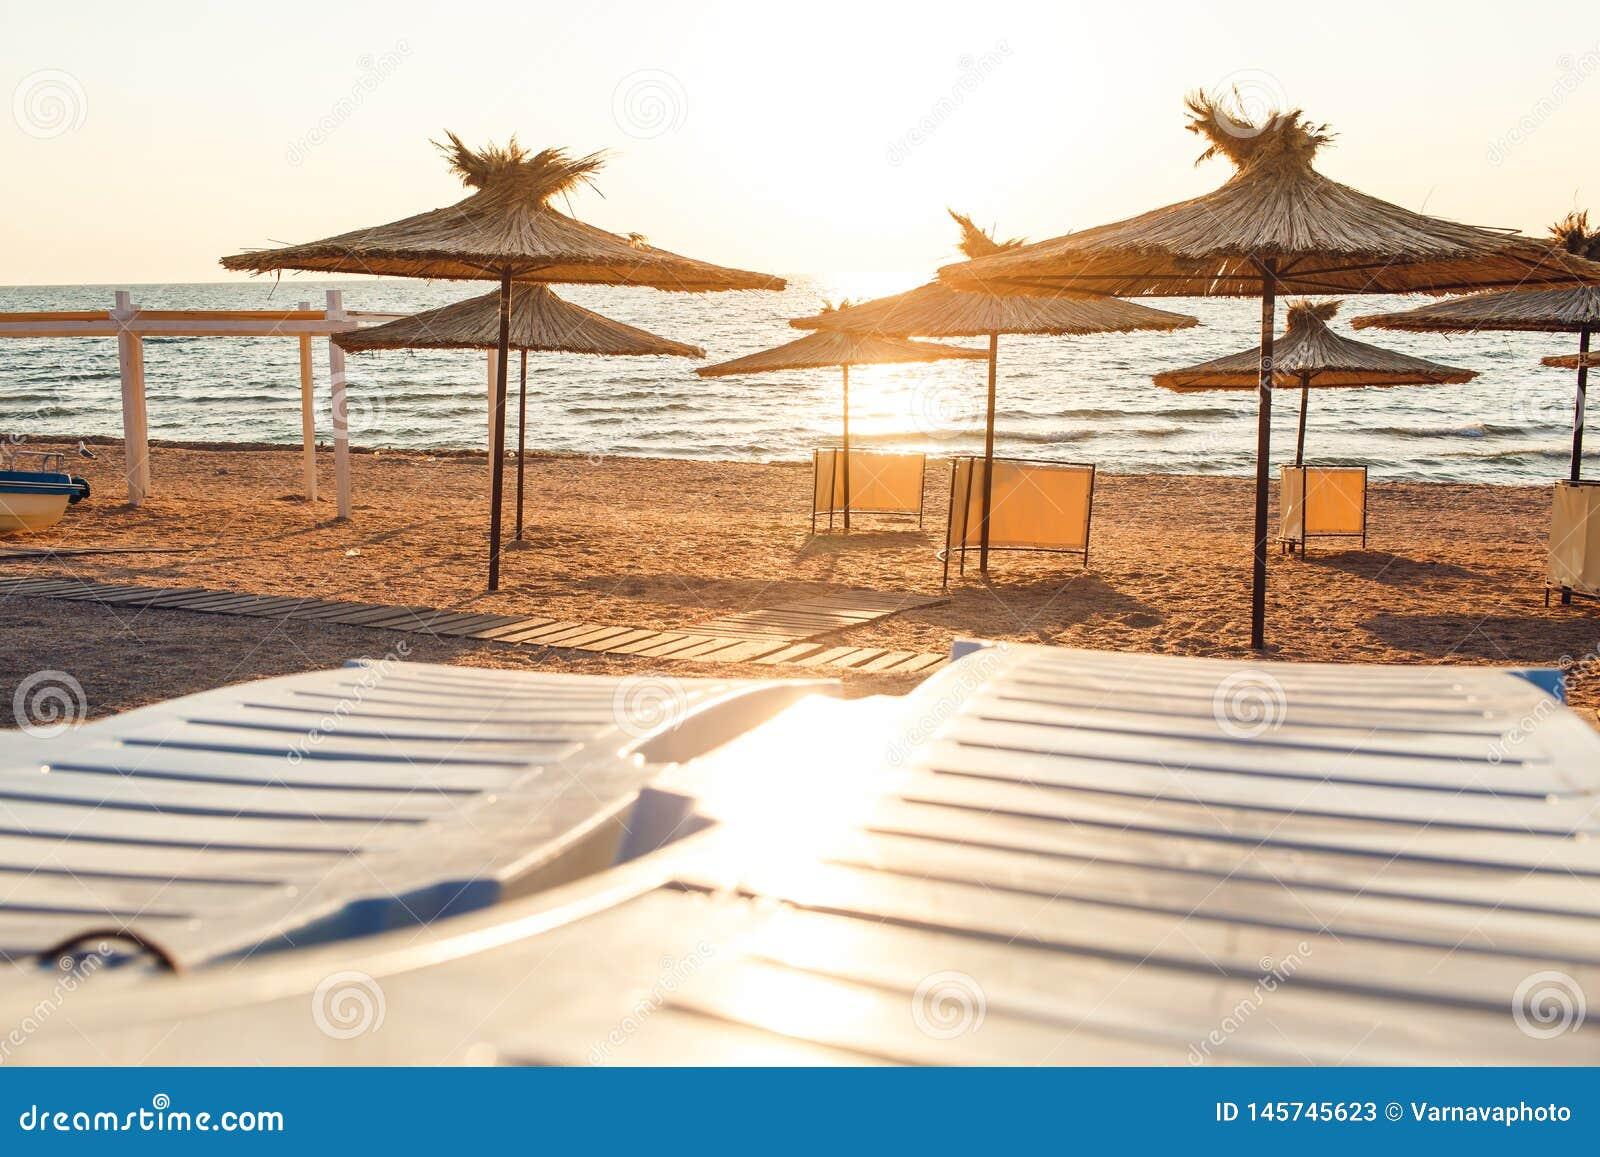 Reed beach umbrellas and sunbeds on sandy seashore in sun.